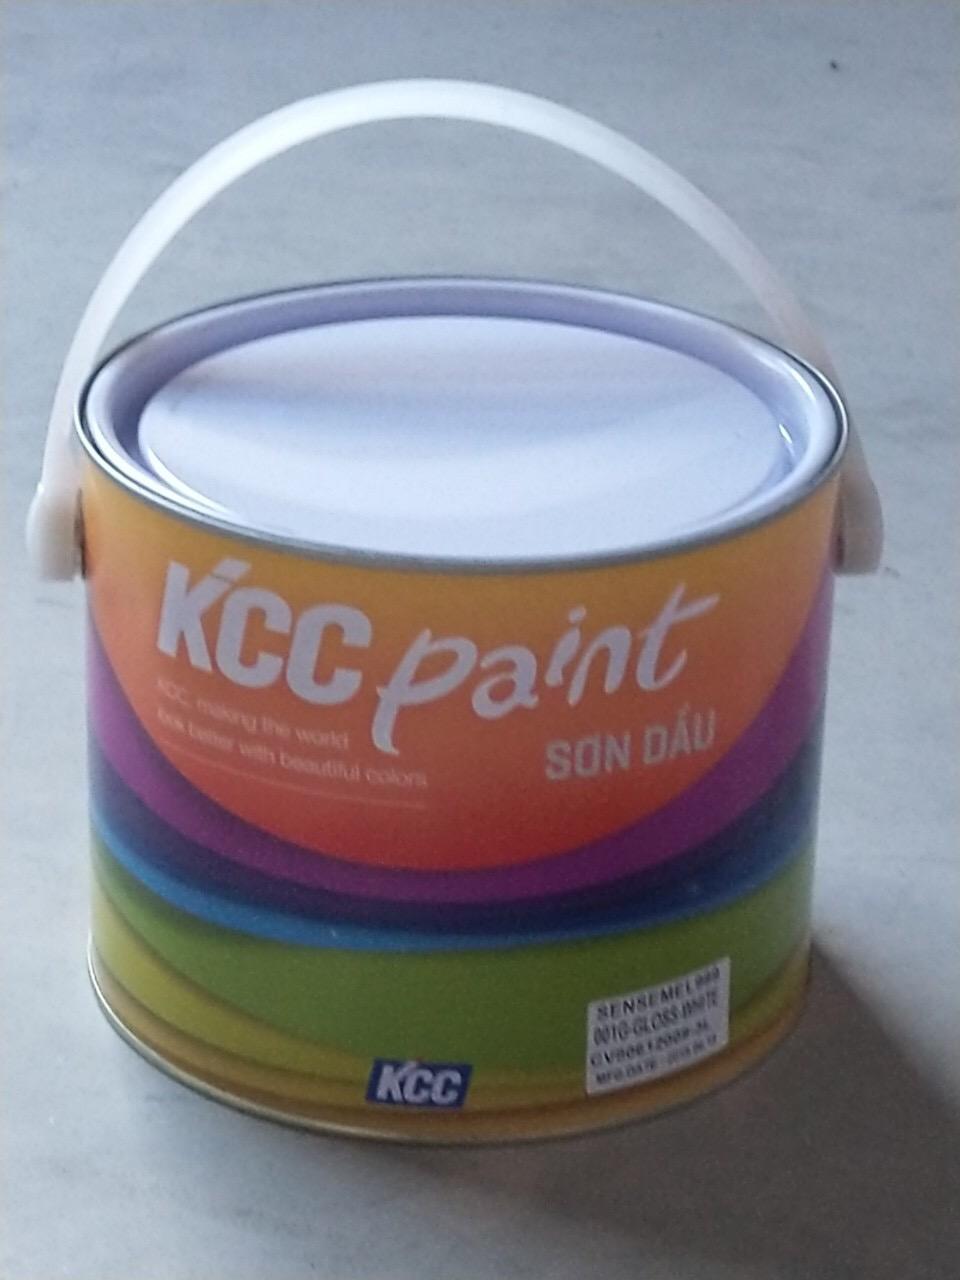 Sơn dầu kcc